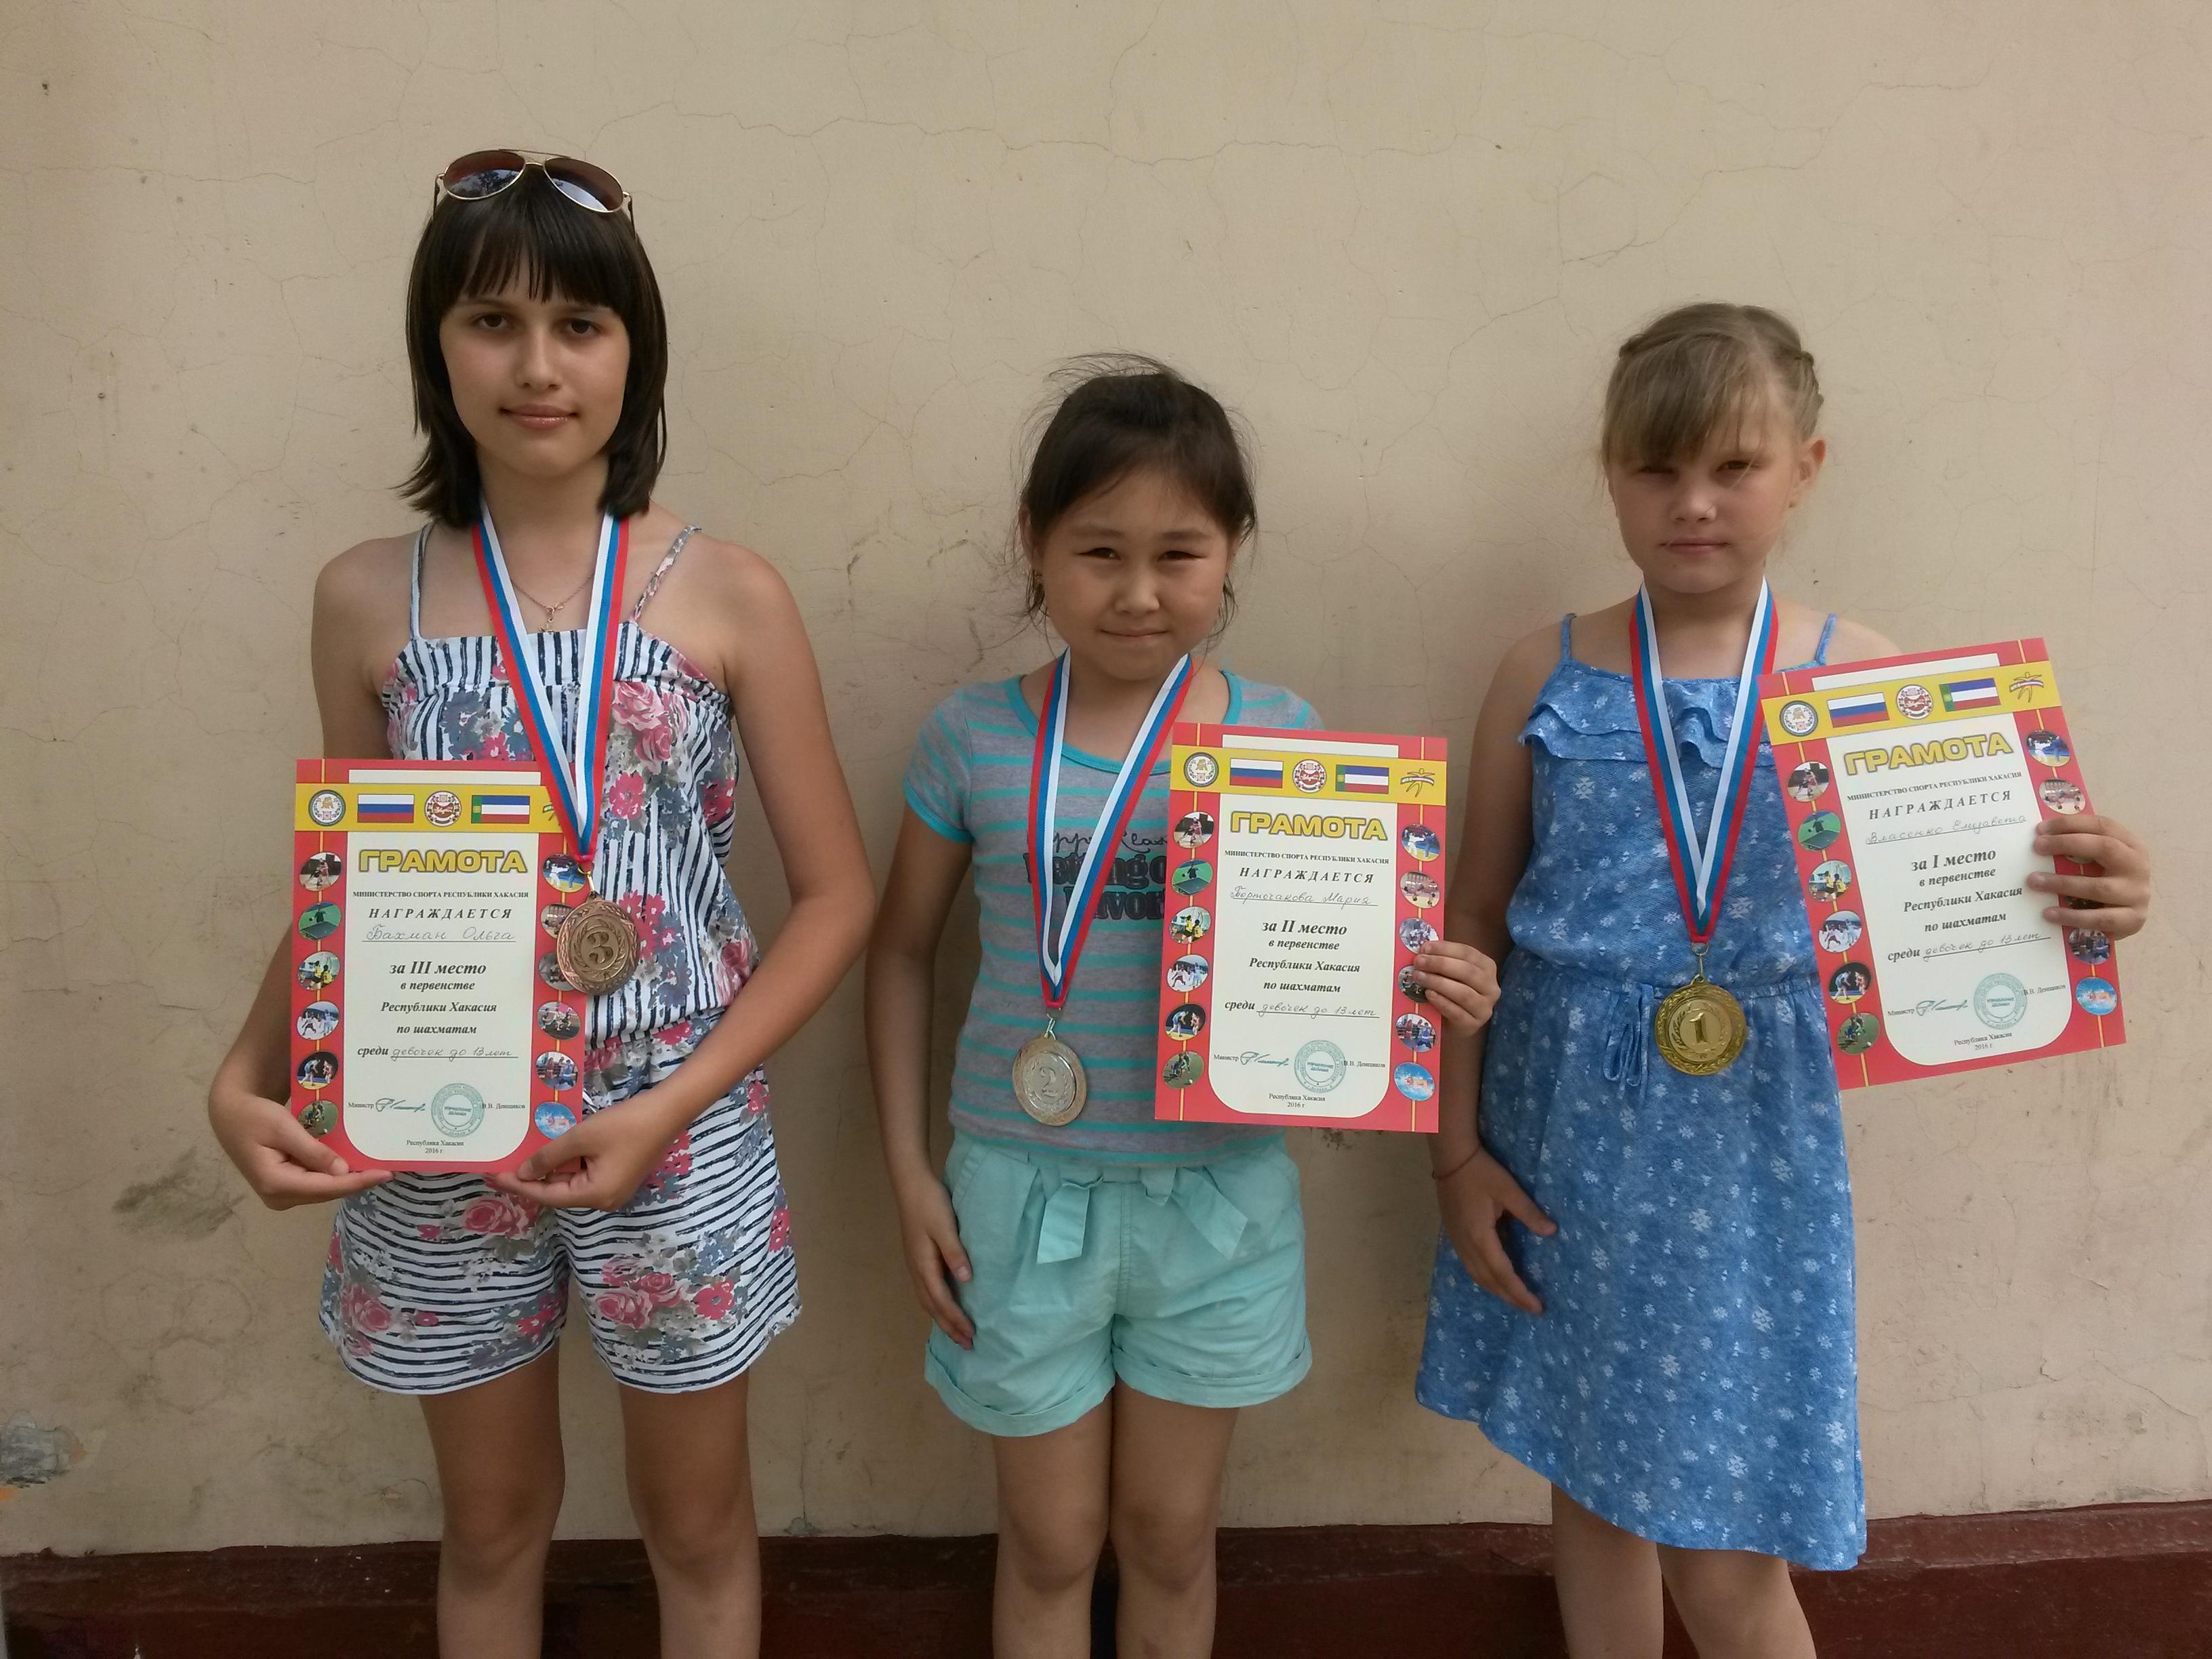 Девочки не старше 12 лет. Слева направо:Ольга Бахман(3 место), Мария Торточакова(2 место),Елизавета Власенко(чемпионка).